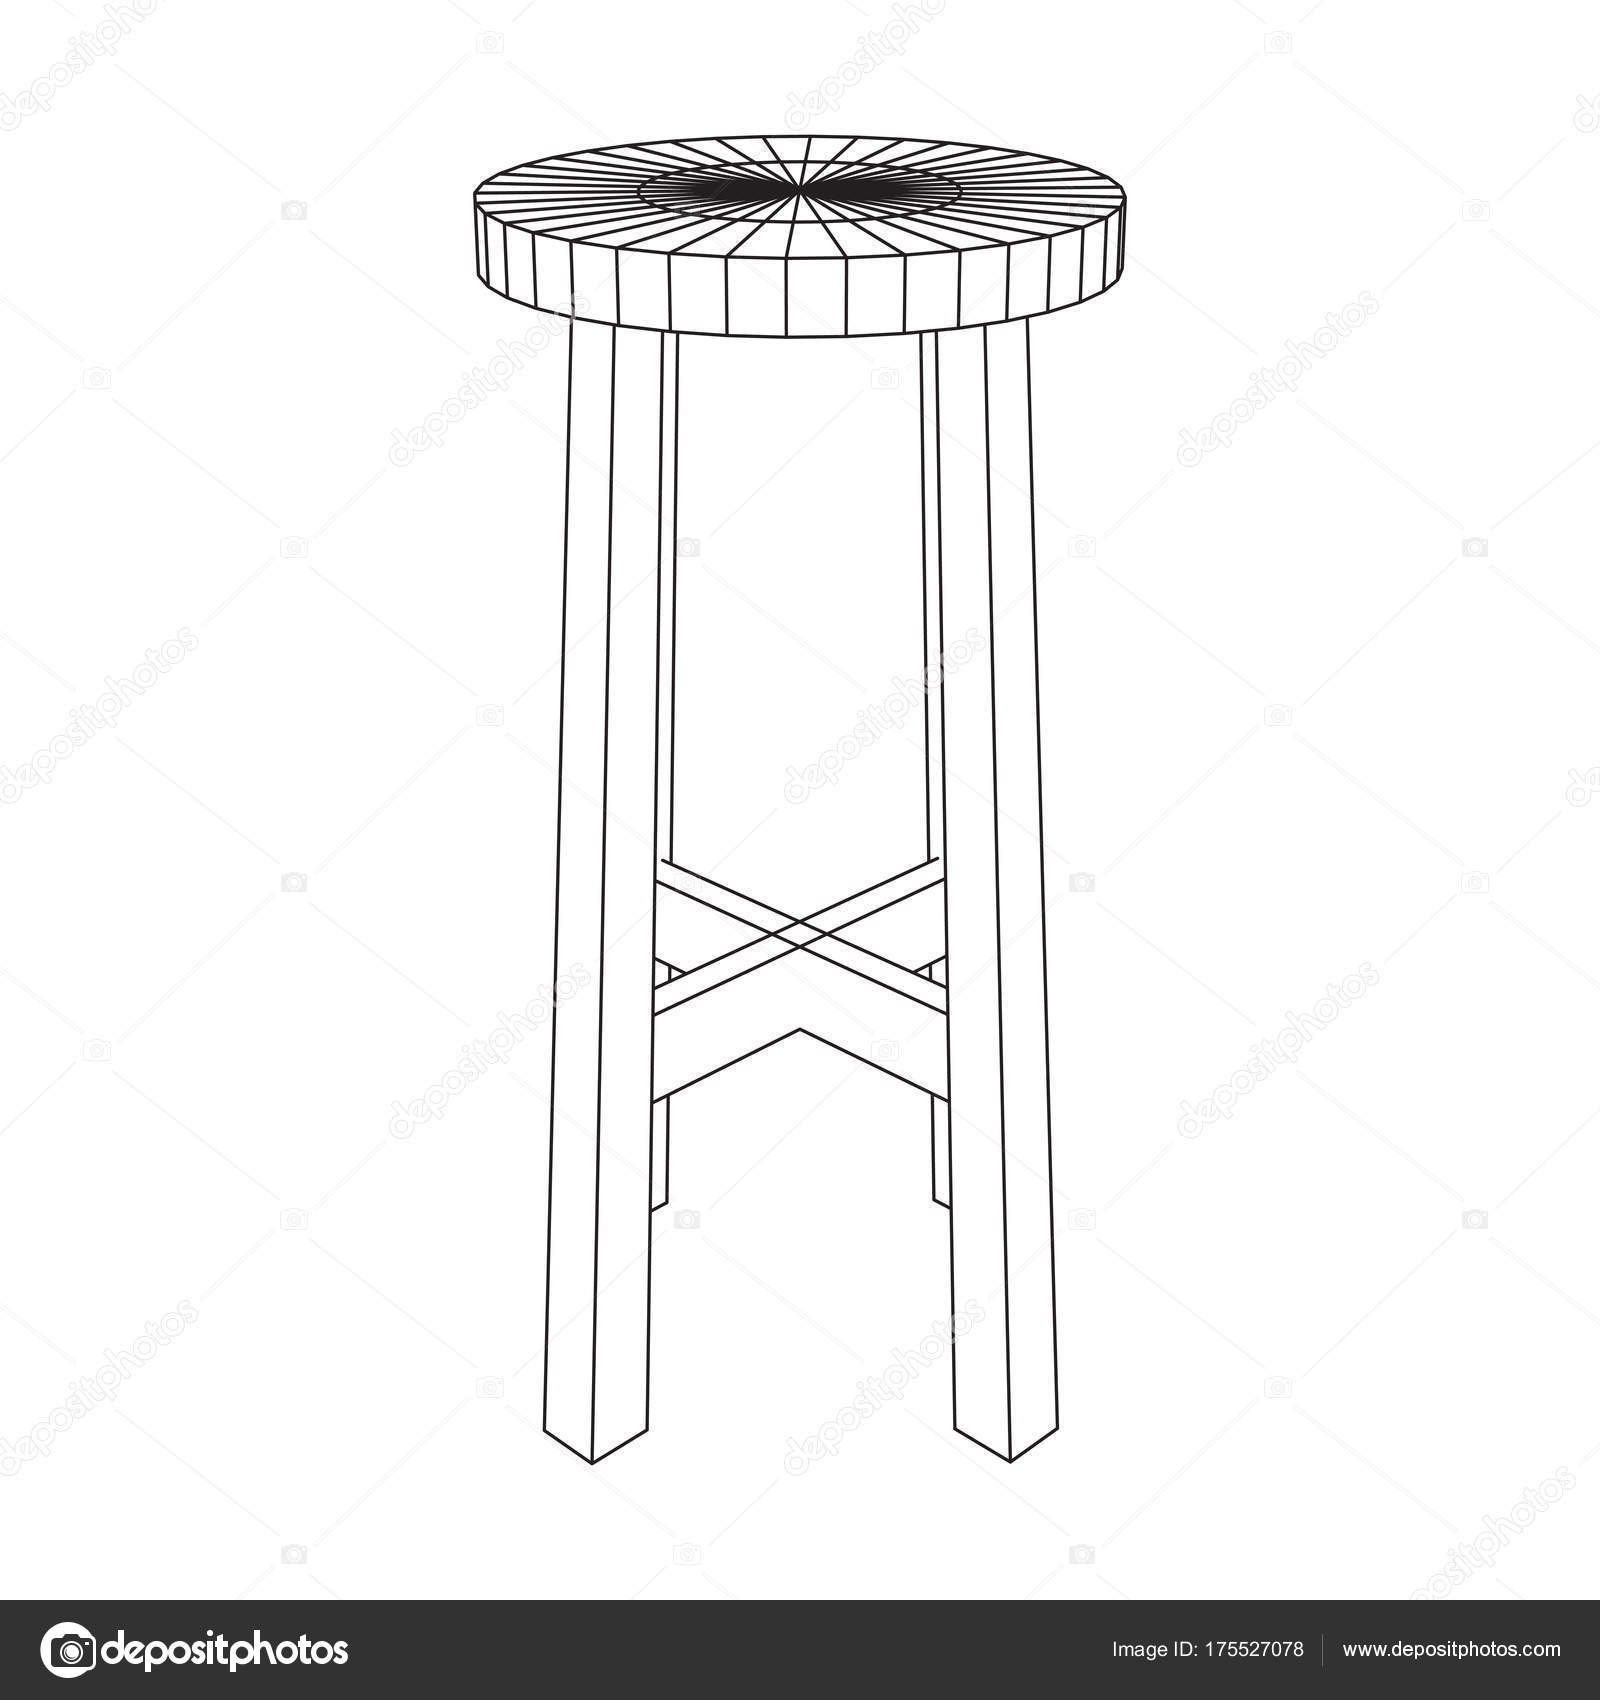 Bar stool furniture wireframe blueprint stock vector newb1 bar stool furniture wireframe blueprint stock vector malvernweather Choice Image